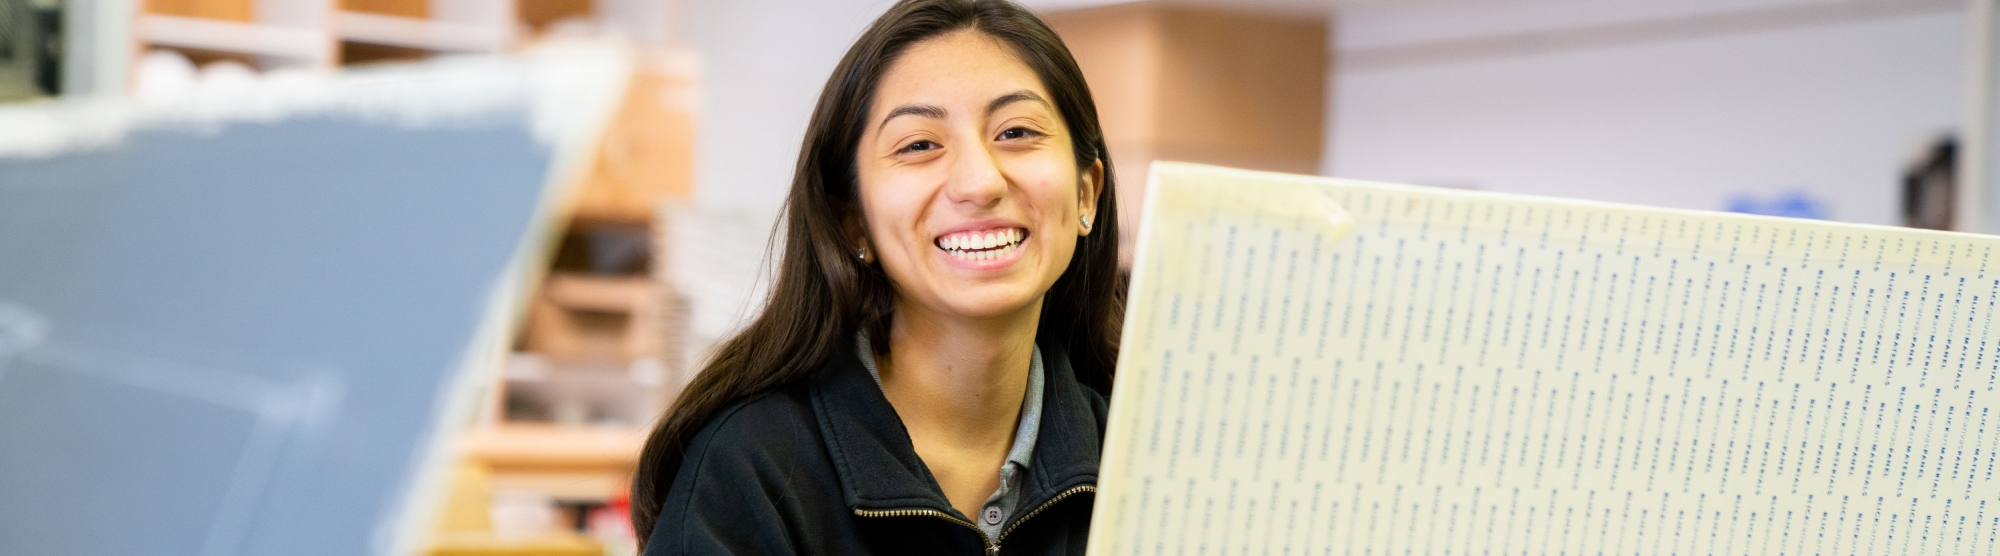 Student Life - Private Boarding High School - Amerigo Chicago